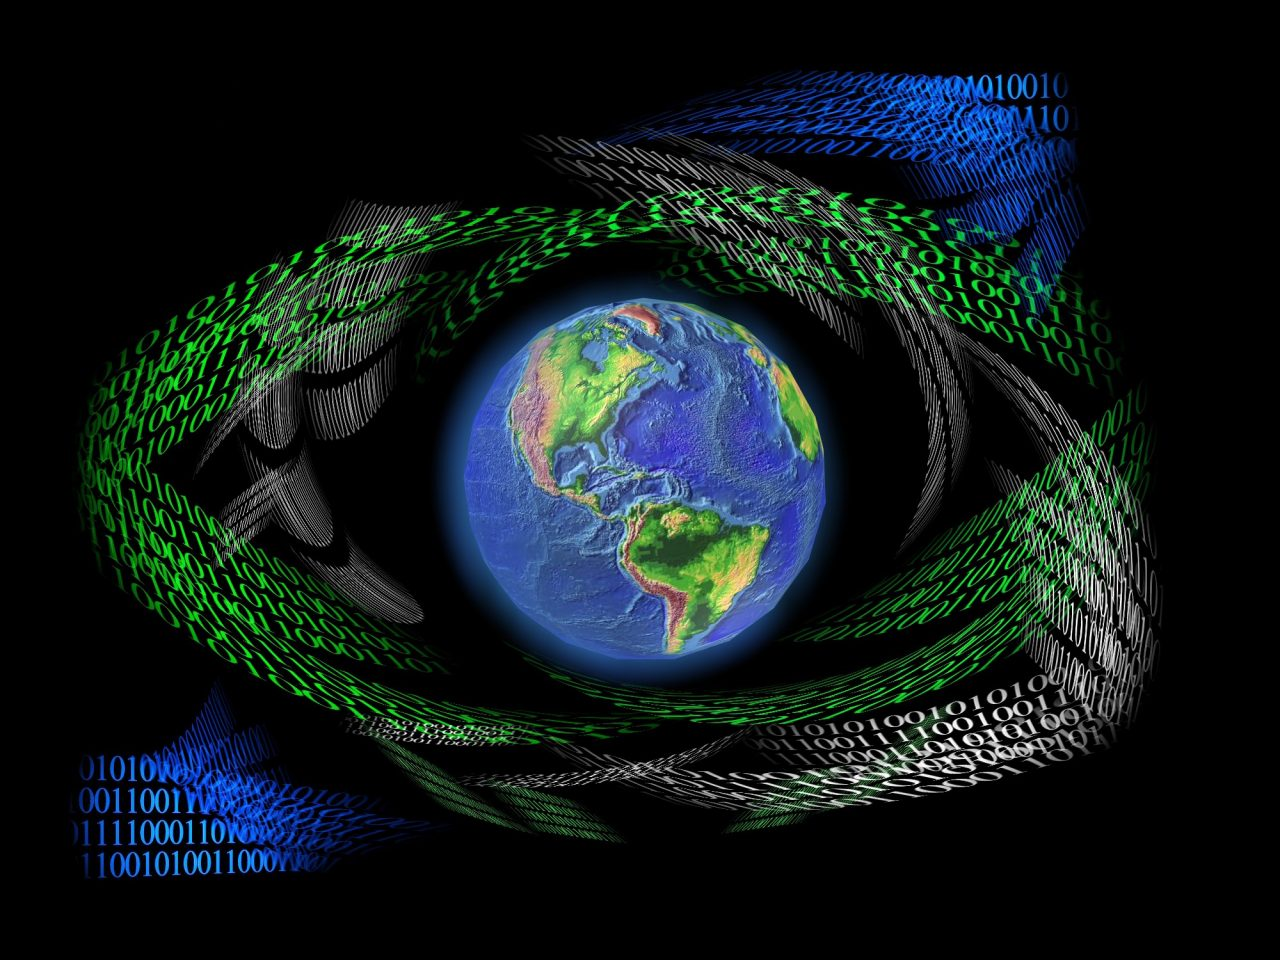 earth and binary codes